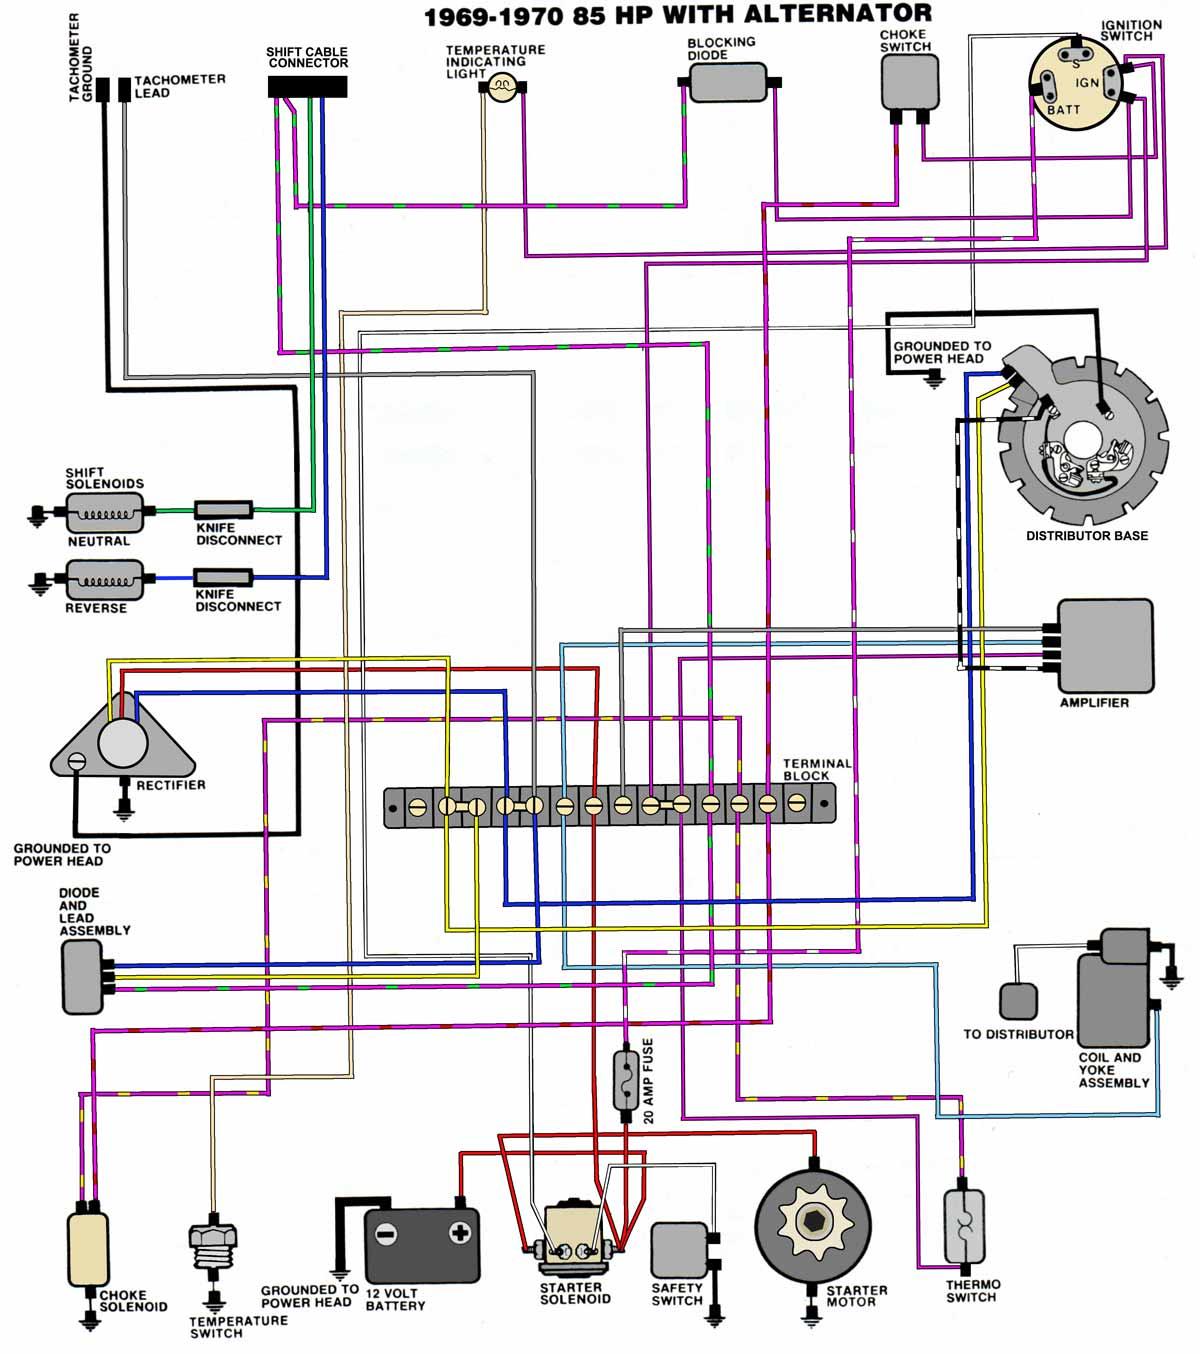 69_70_V4?resize\=665%2C750 1971 johnson control wiring diagram gandul 45 77 79 119 Metasys Ahu Controller at reclaimingppi.co